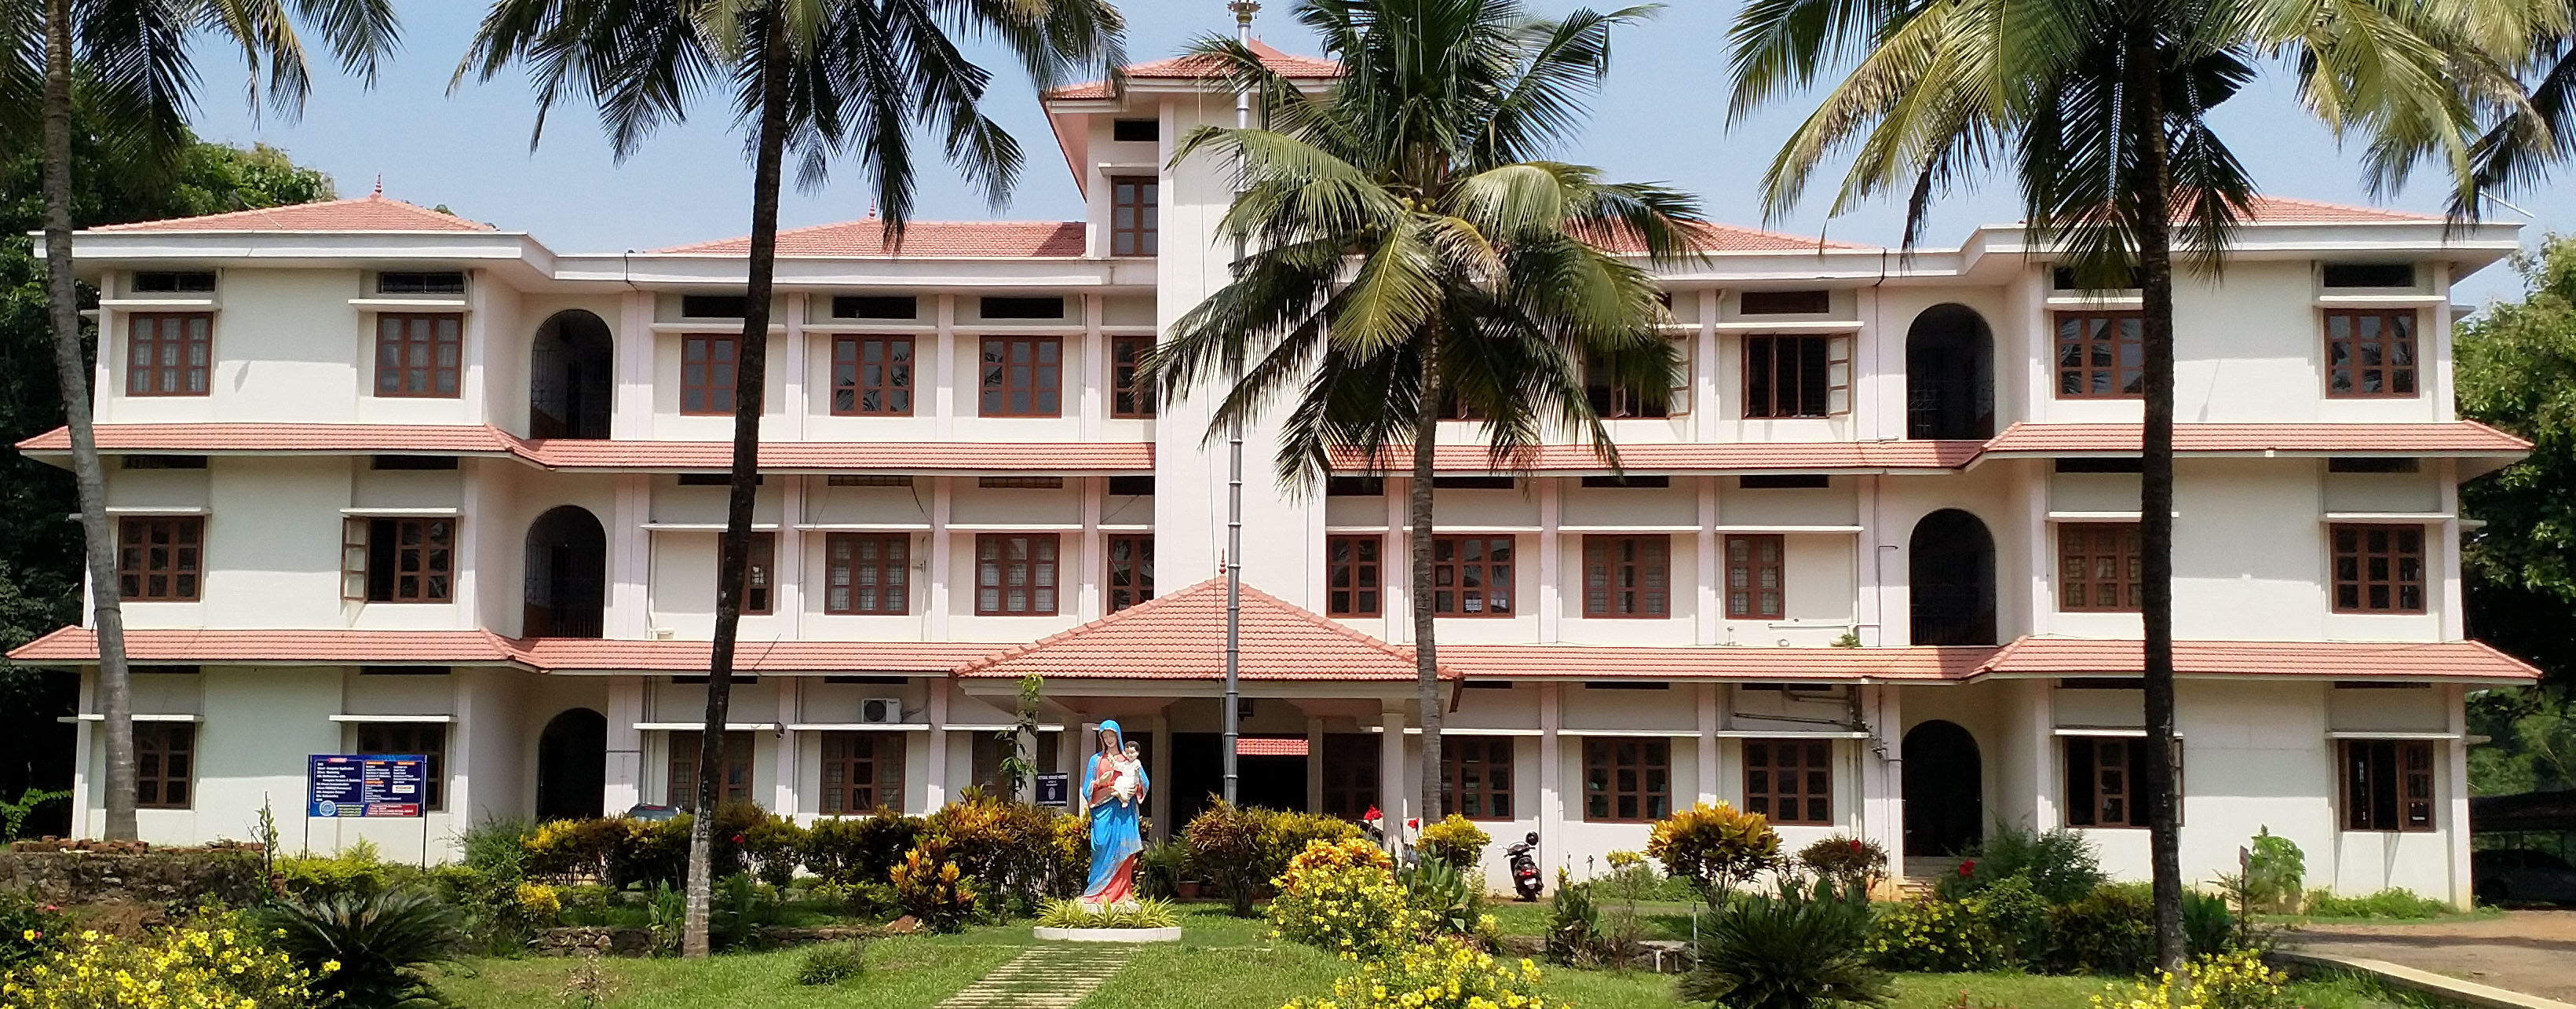 Bishop Vayalil Memorial Holy Cross College, Kottayam Image